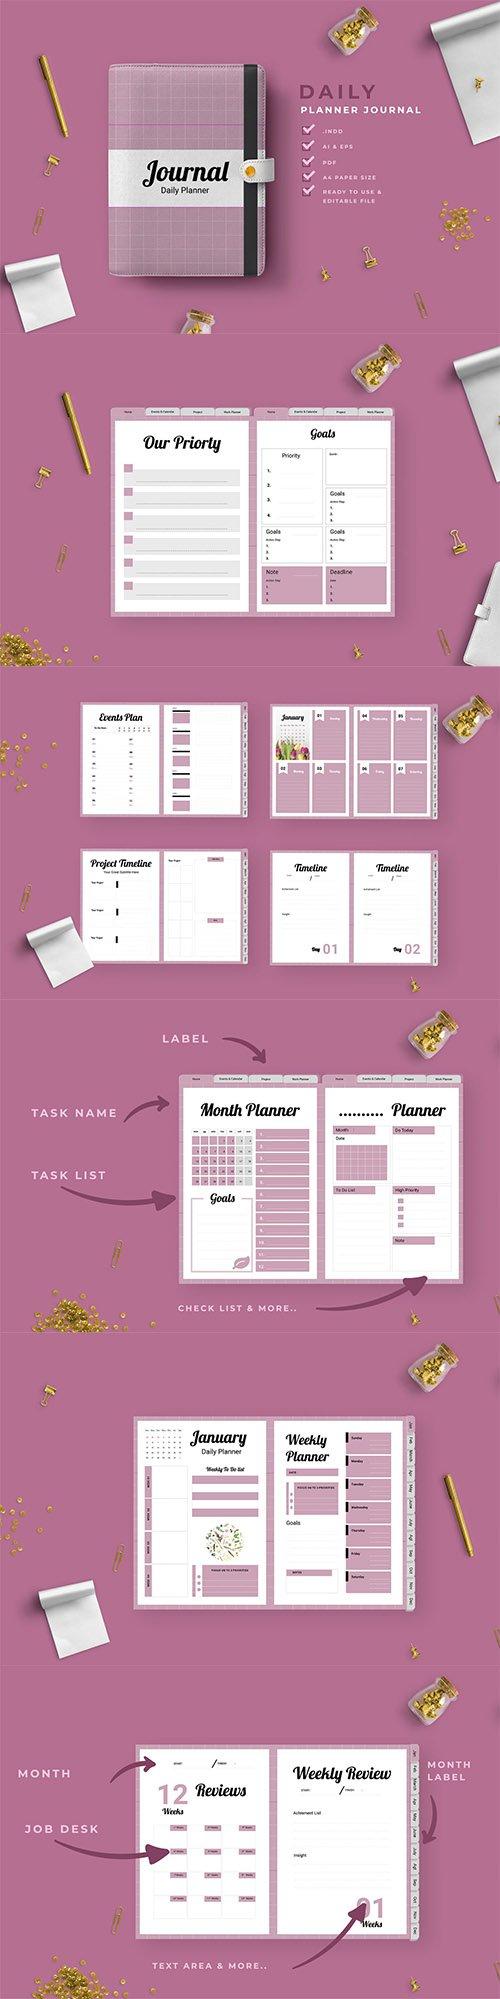 Kyra - Work Daily Planner Journal